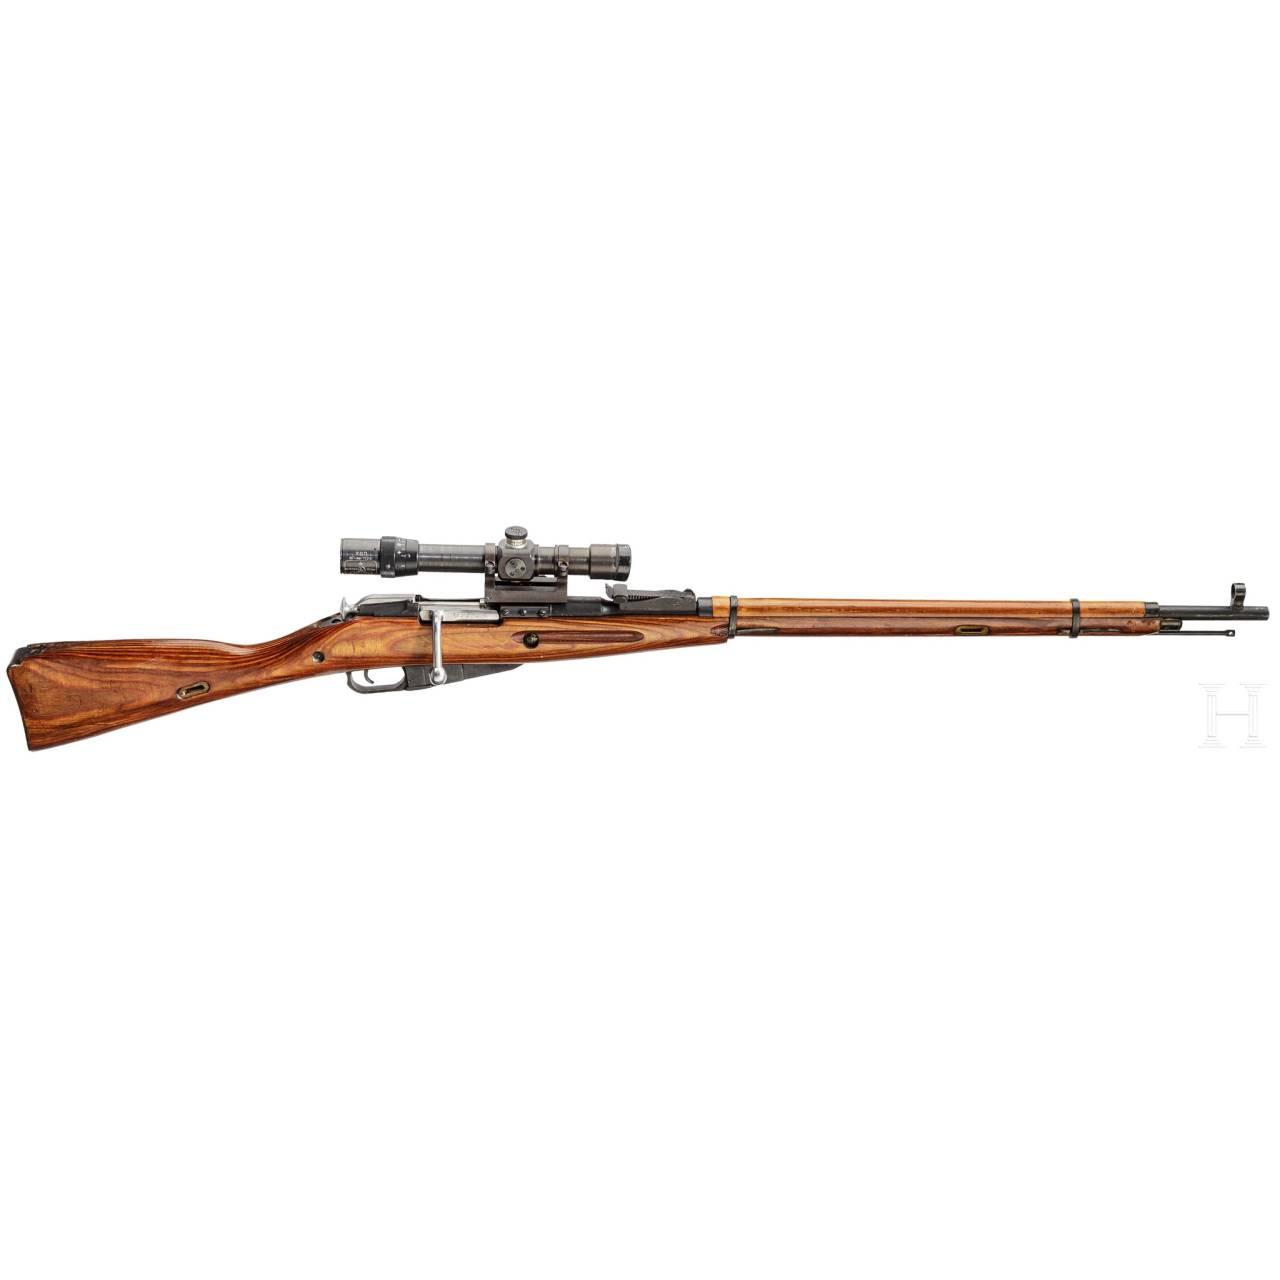 A Sniper Rifle Mosin-Nagant Mod. 1891/30, with original PE-scope 1st issue